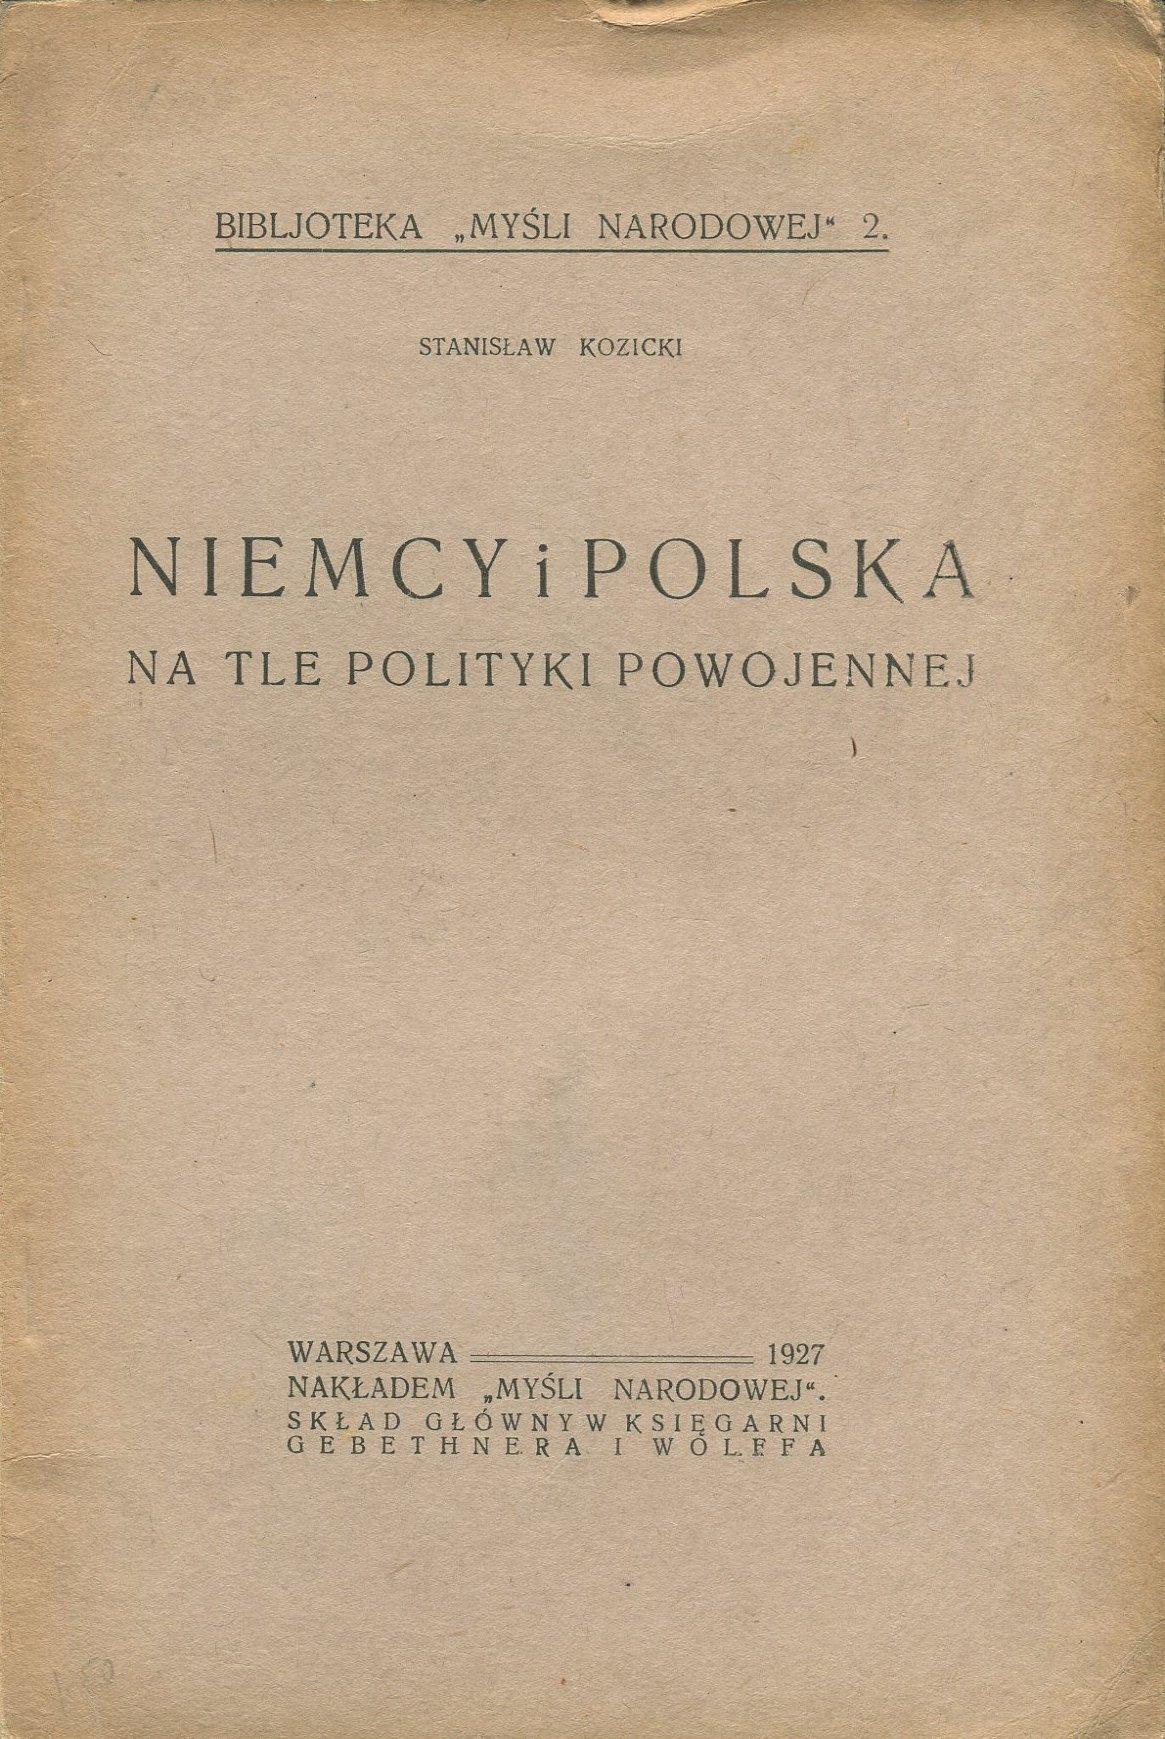 NIEMCY I POLSKA NA TLE POLITYKI Kozicki endecja